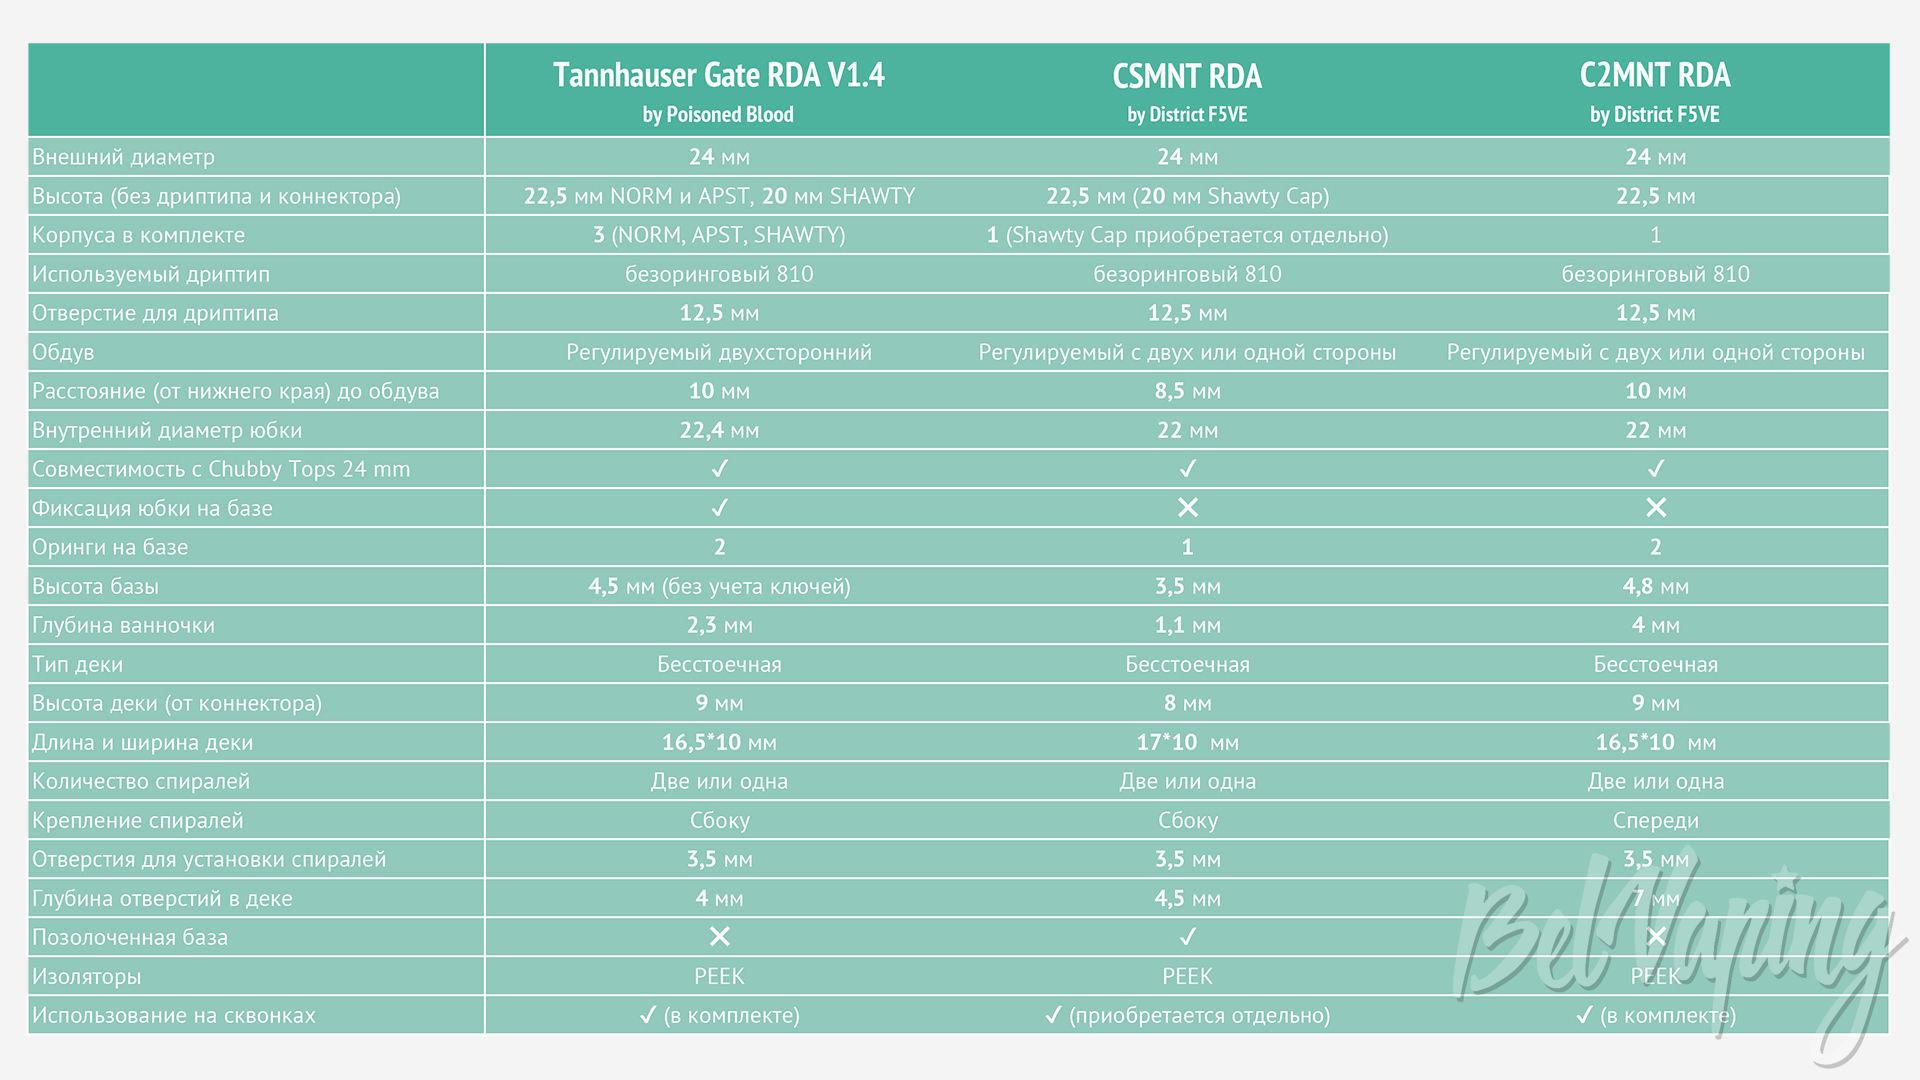 Таблица сравнения Tannhauser Gate RDA, CSMNT RDA и C2MNT RDA